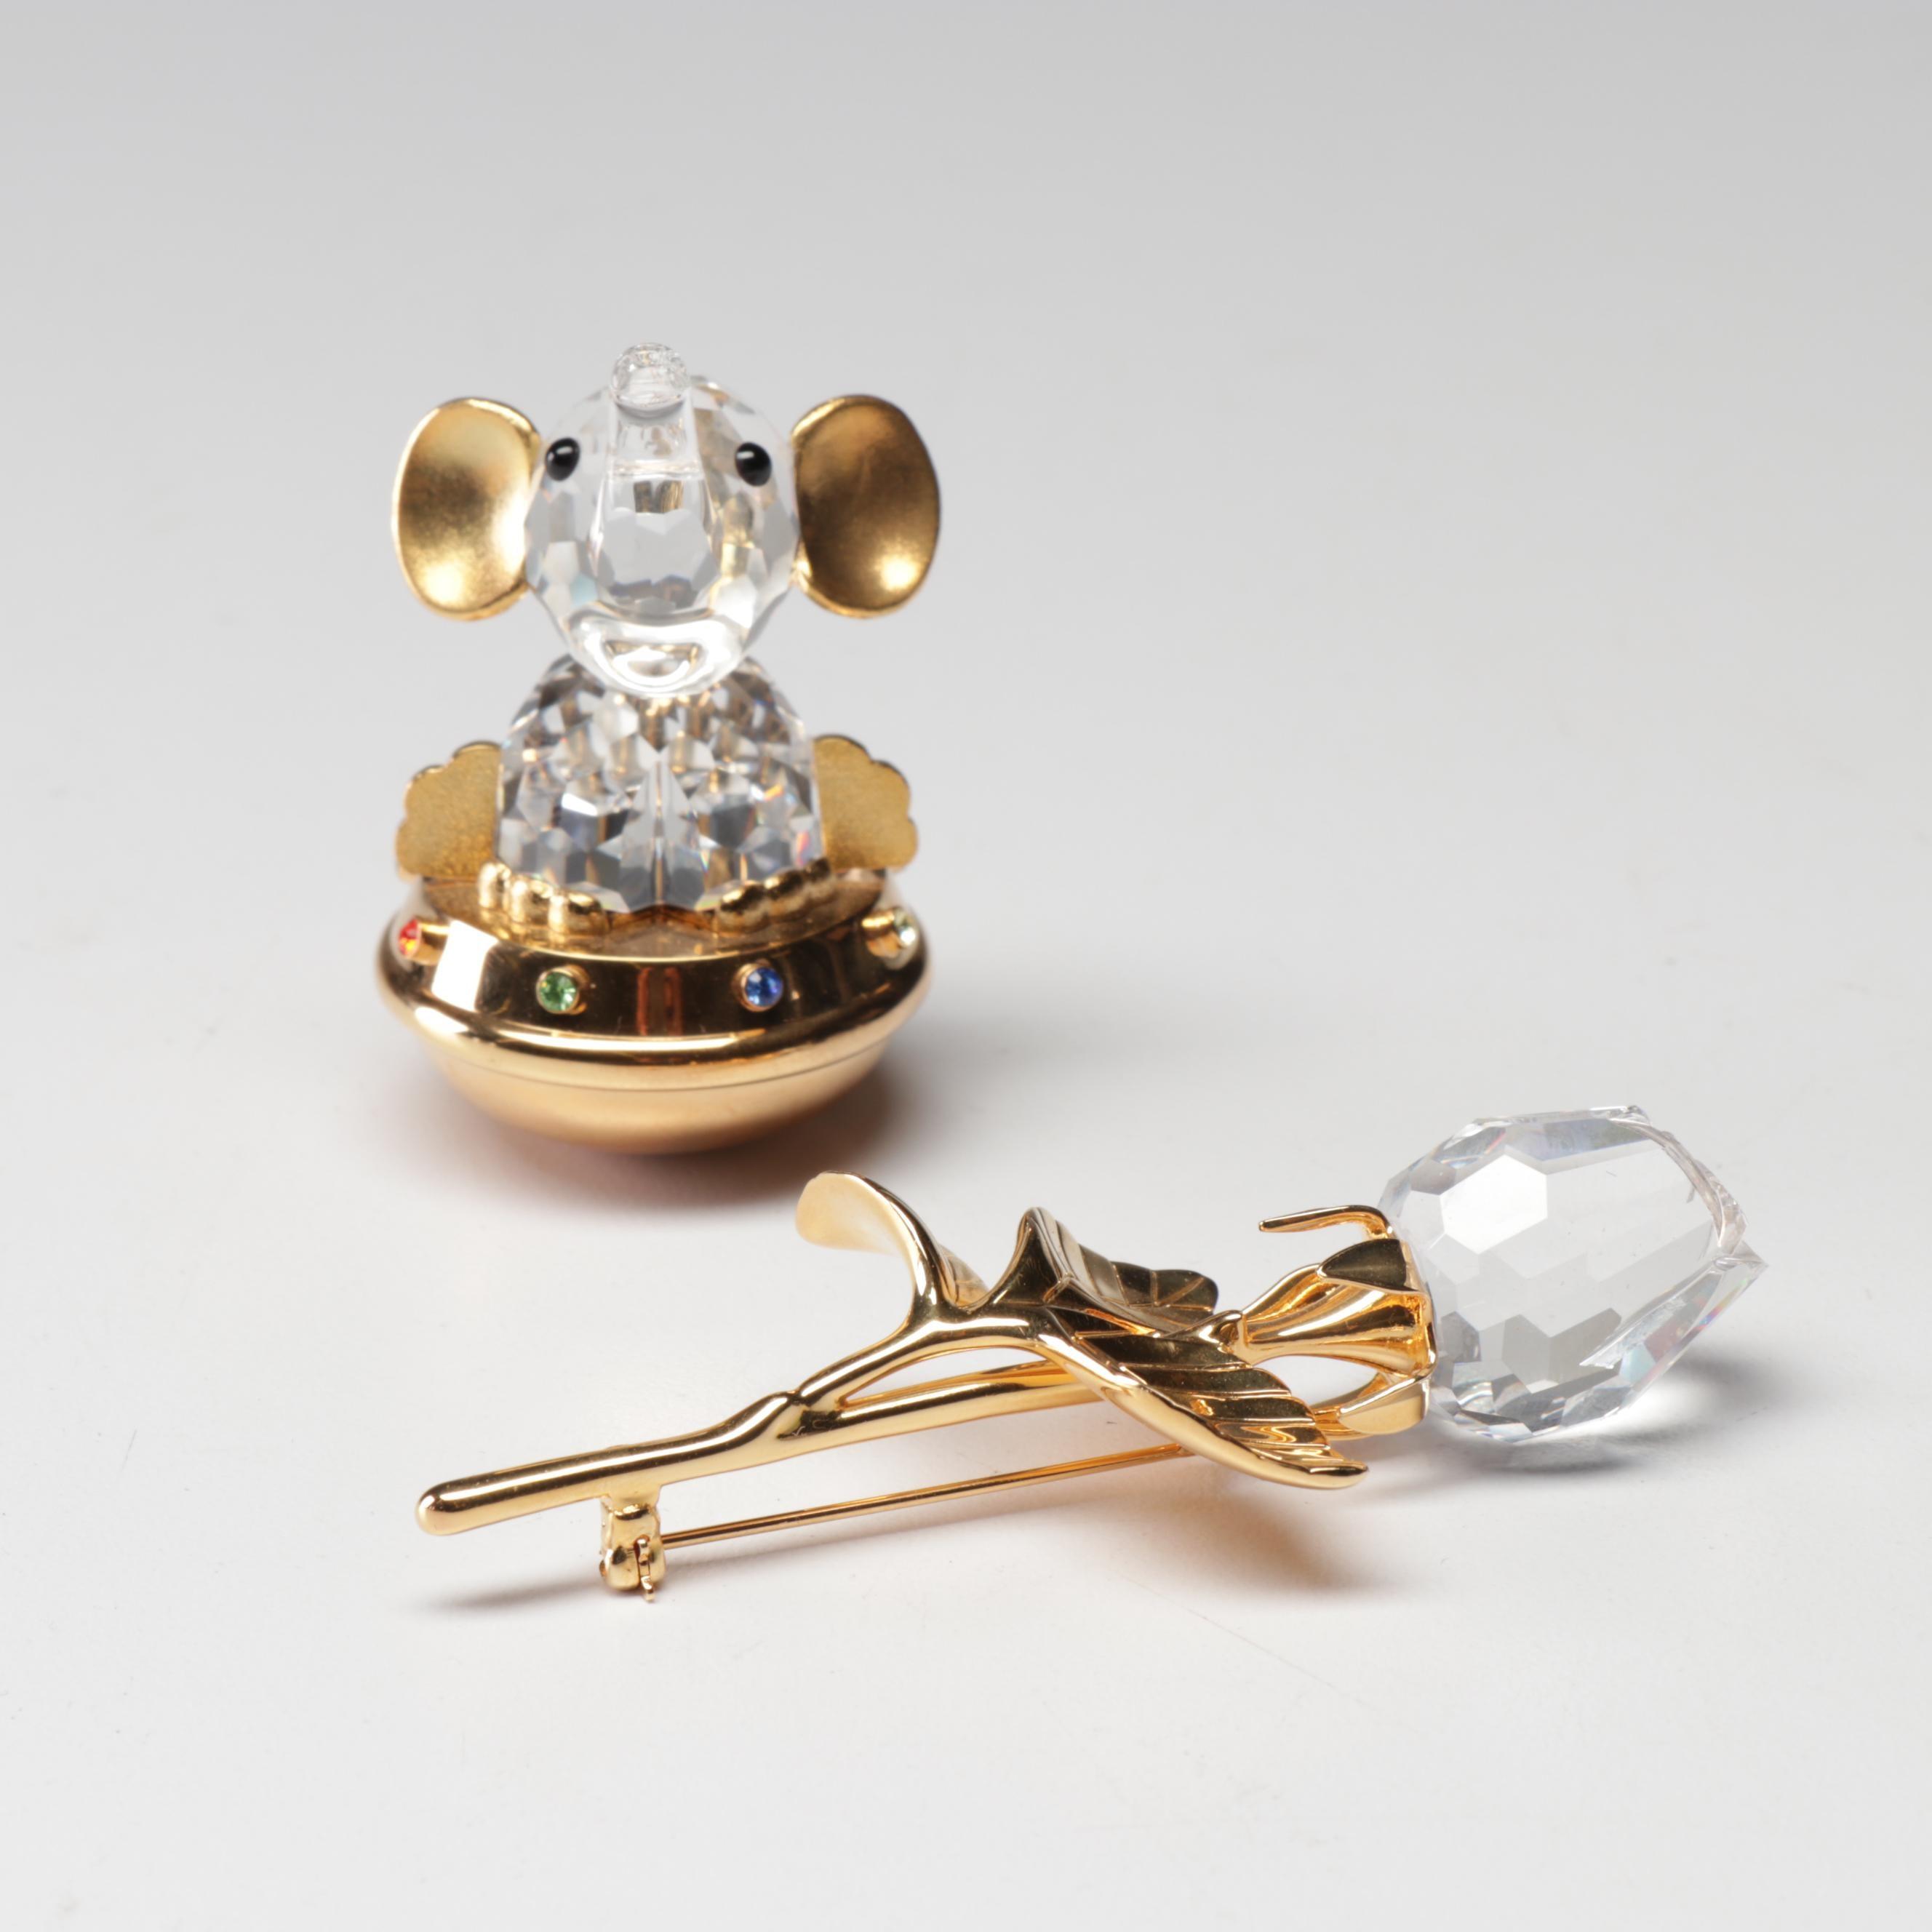 Swarovski Crystal Elephant Figurine and Rose Brooch